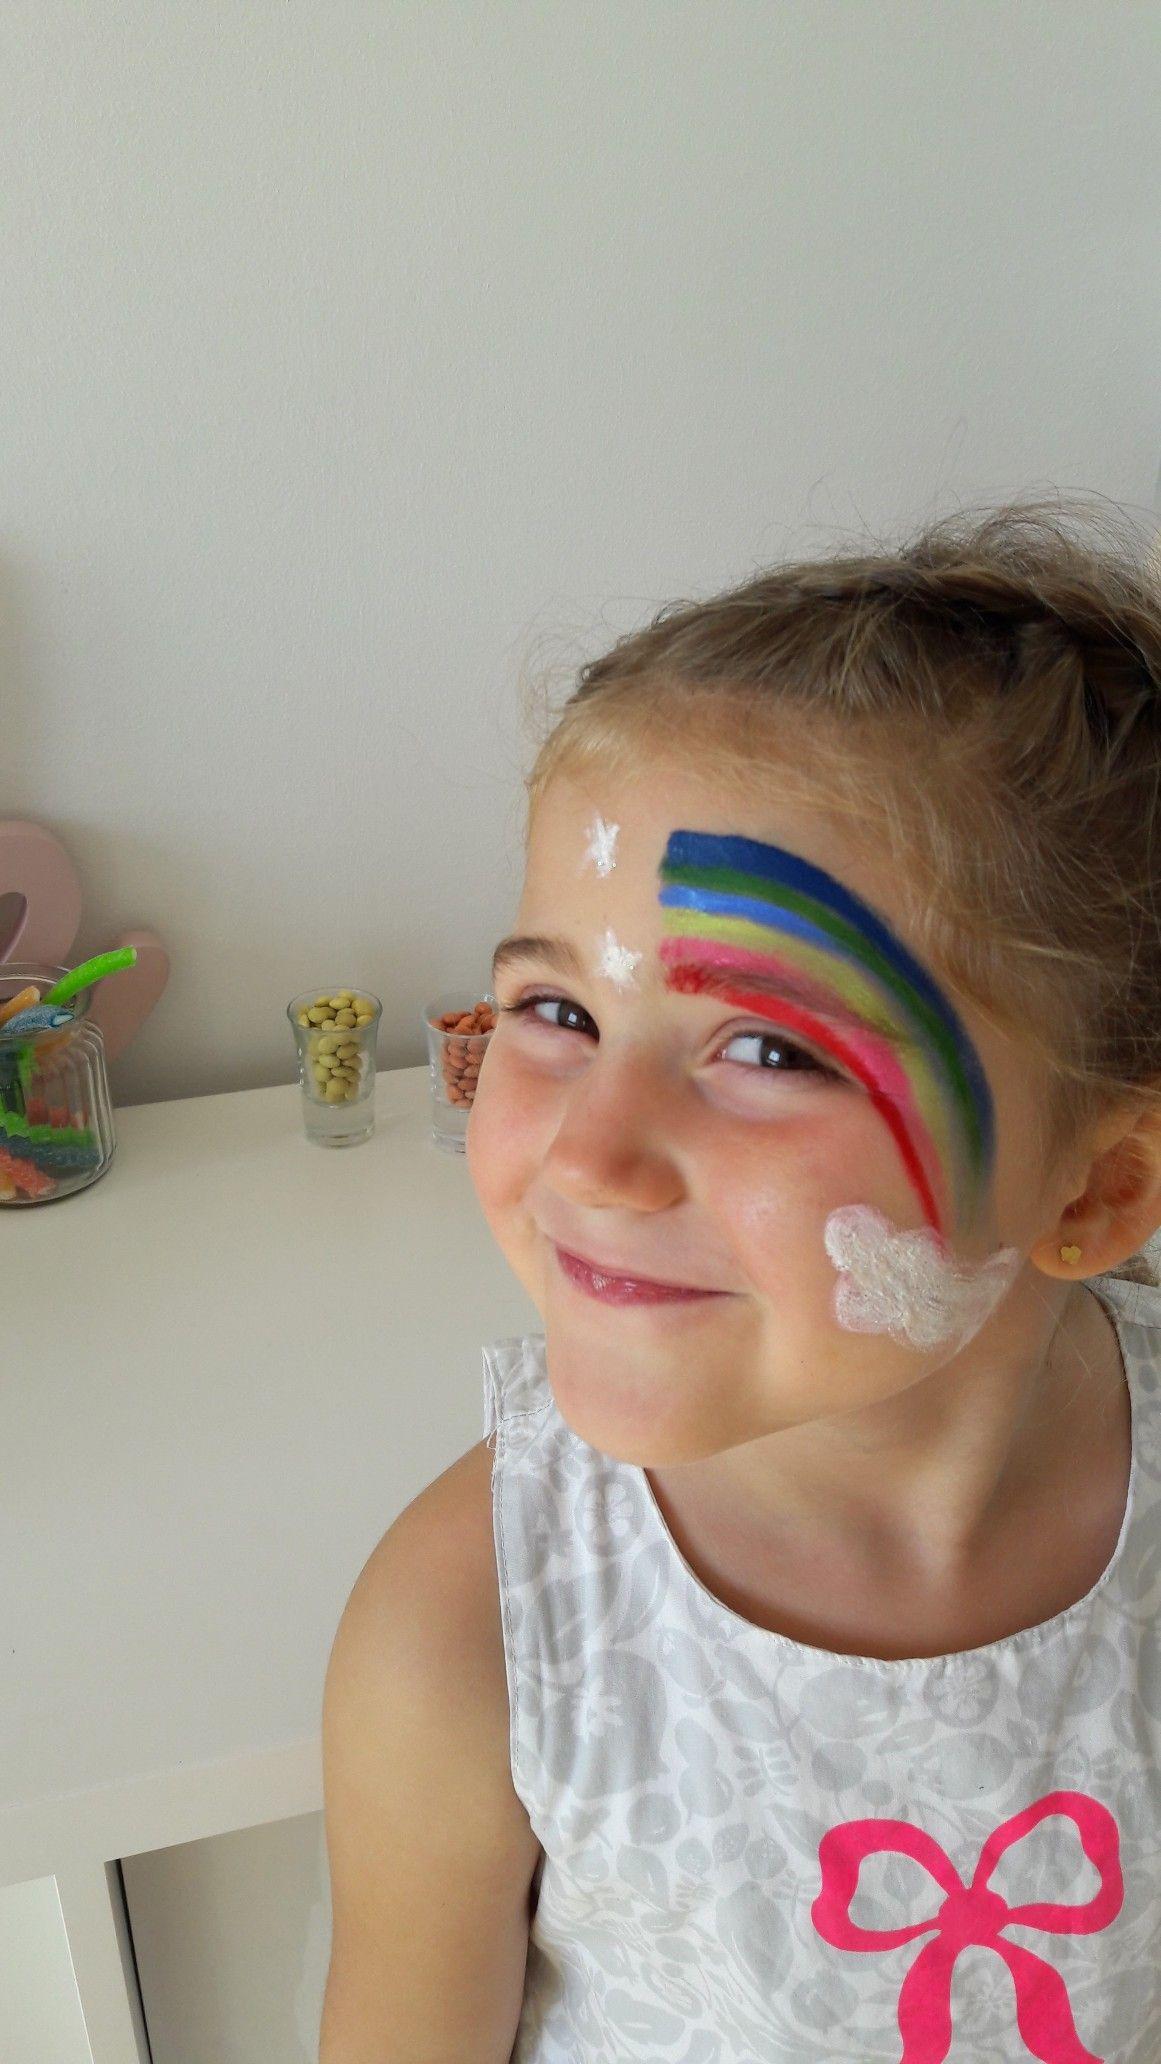 maquillage arc en ciel diy maquillage enfant anniversaire arcenciel licorne multicolore. Black Bedroom Furniture Sets. Home Design Ideas